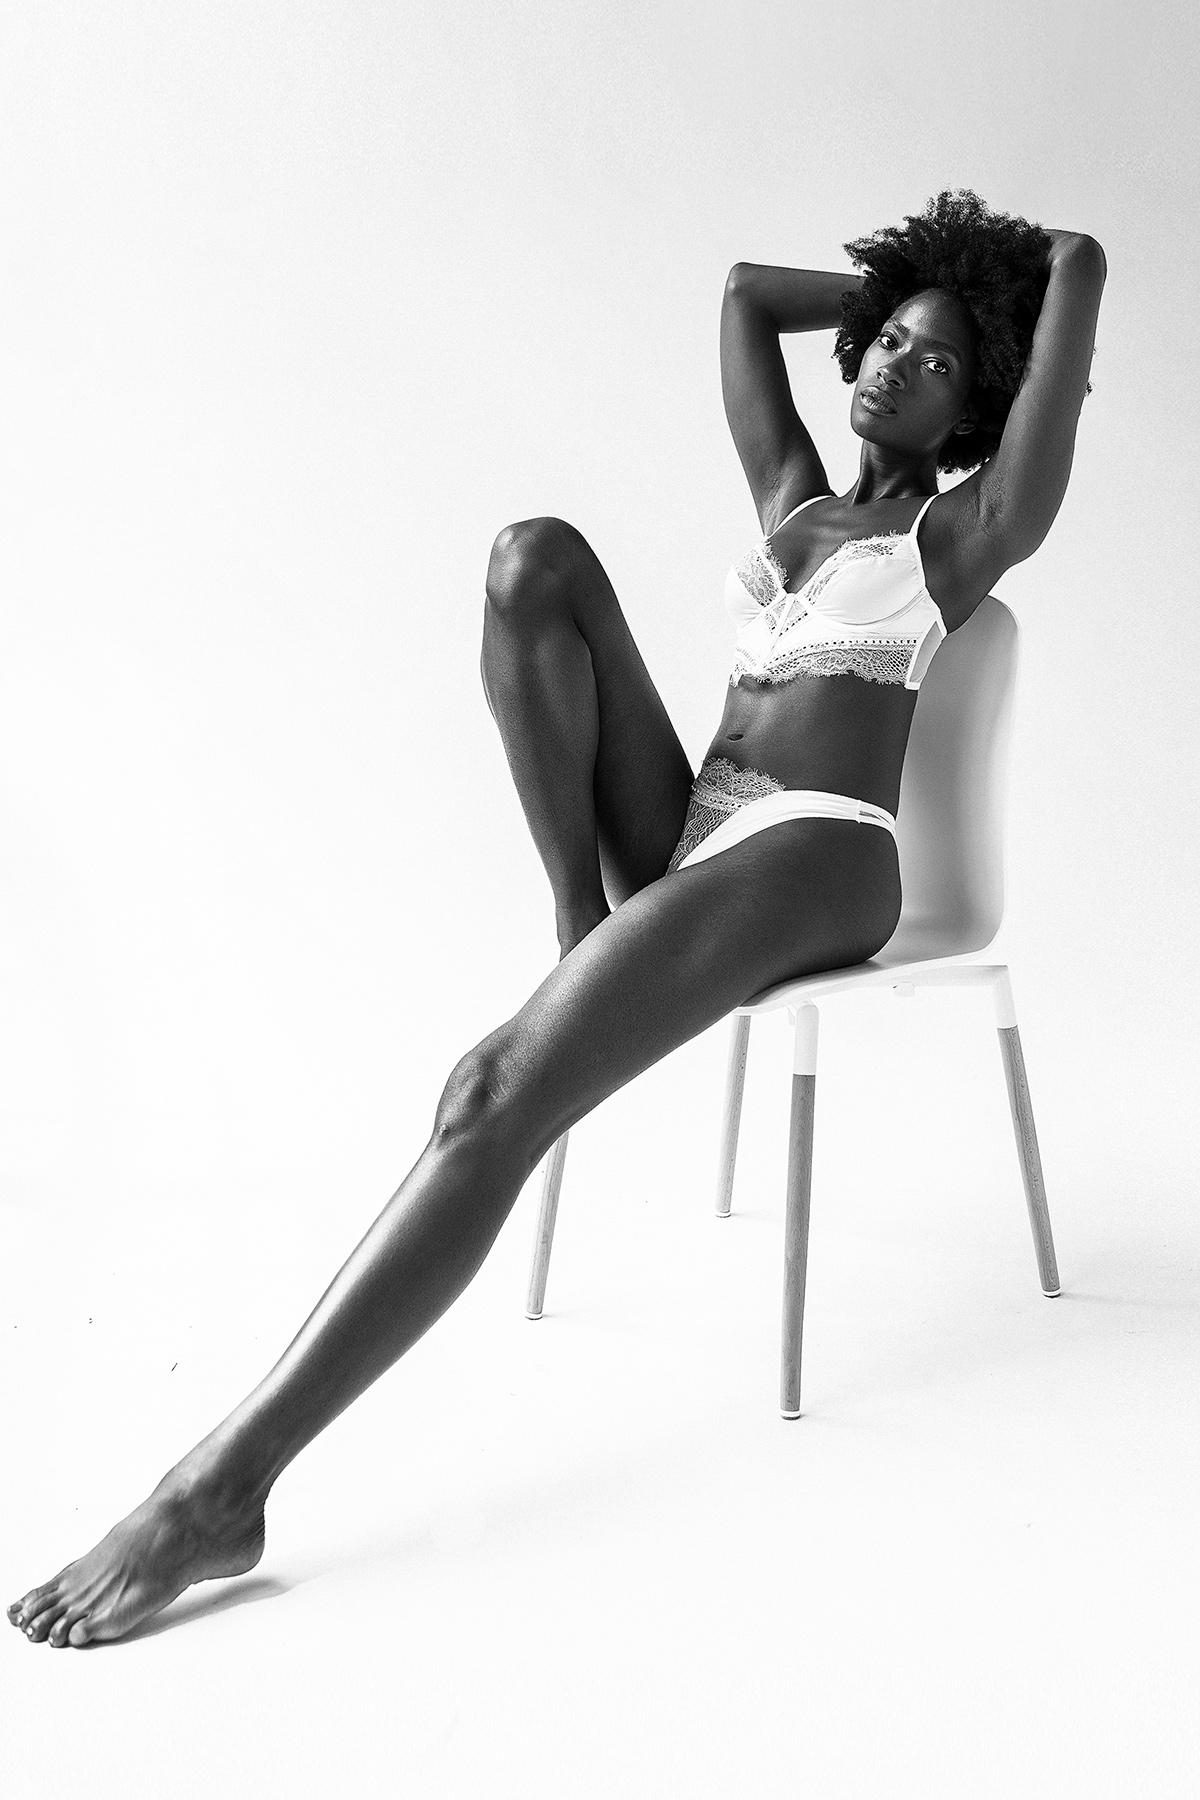 mirza-babic-fashion-photography-new-york-ny-nikon-high-fashion-lingerie-smile-intimates8.jpg